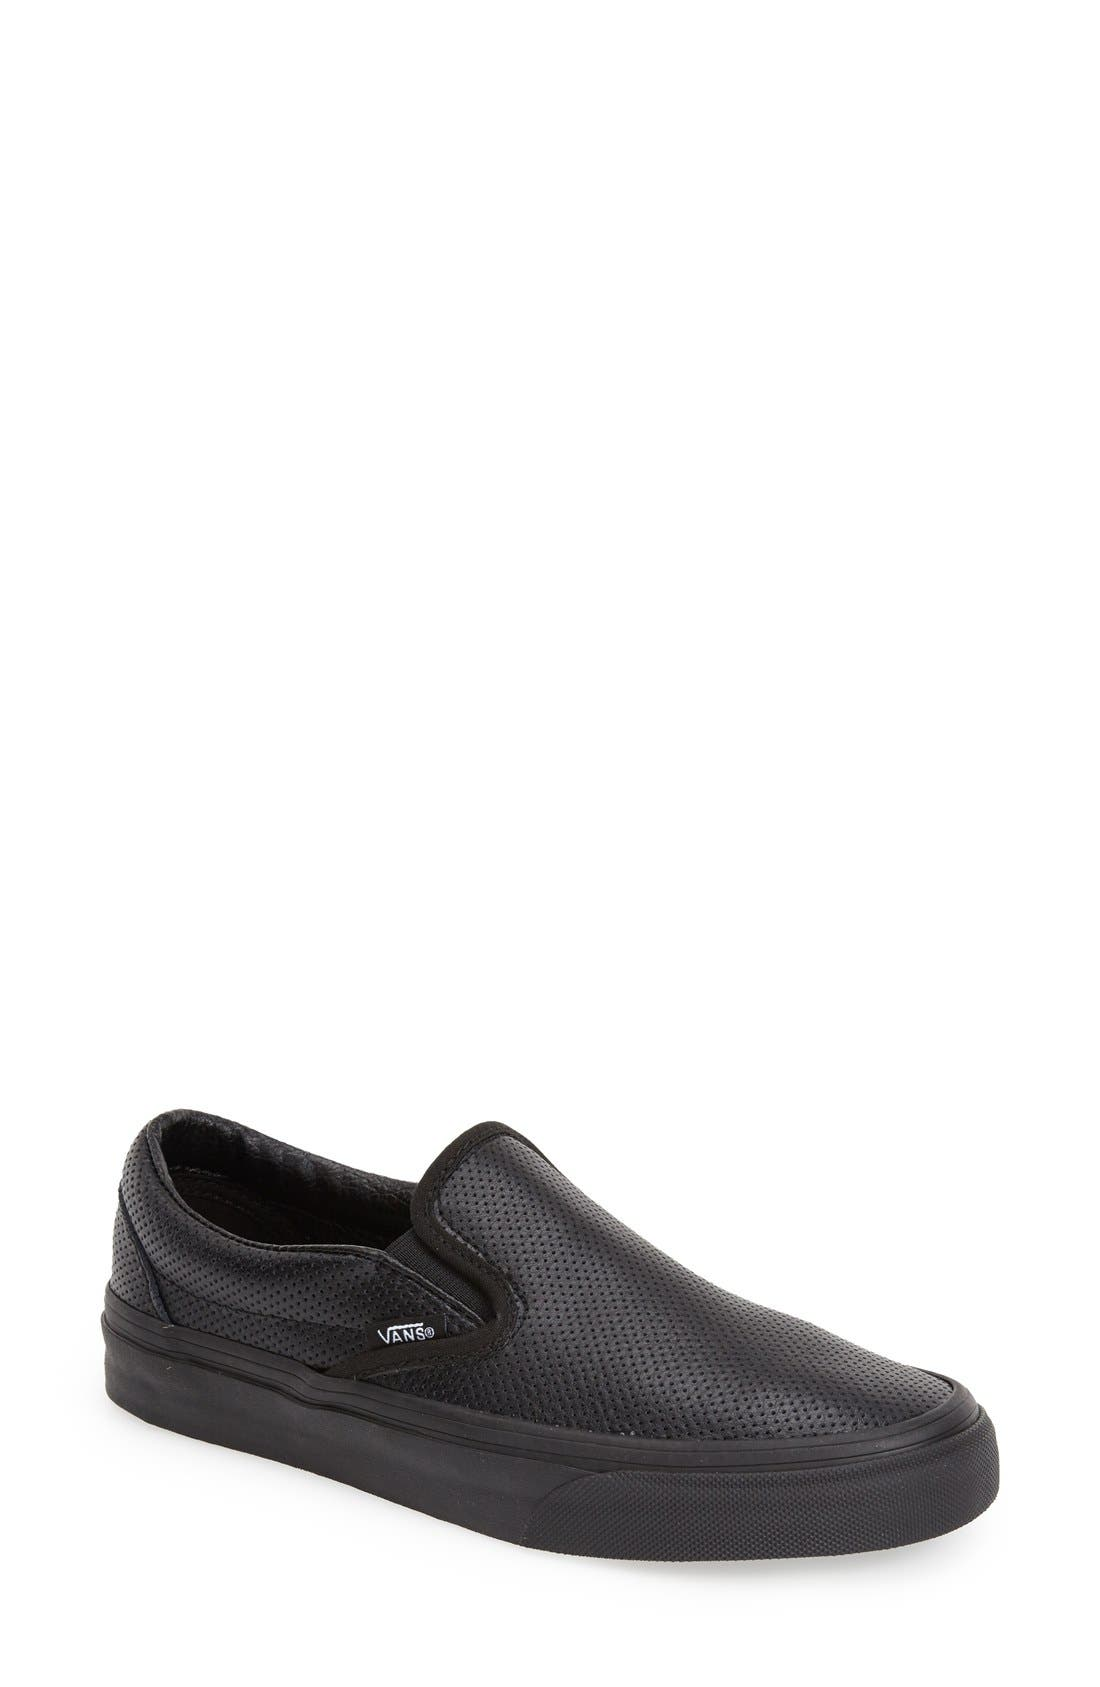 Alternate Image 1 Selected - Vans 'Classic - Perforated' Slip-On Sneaker (Women)